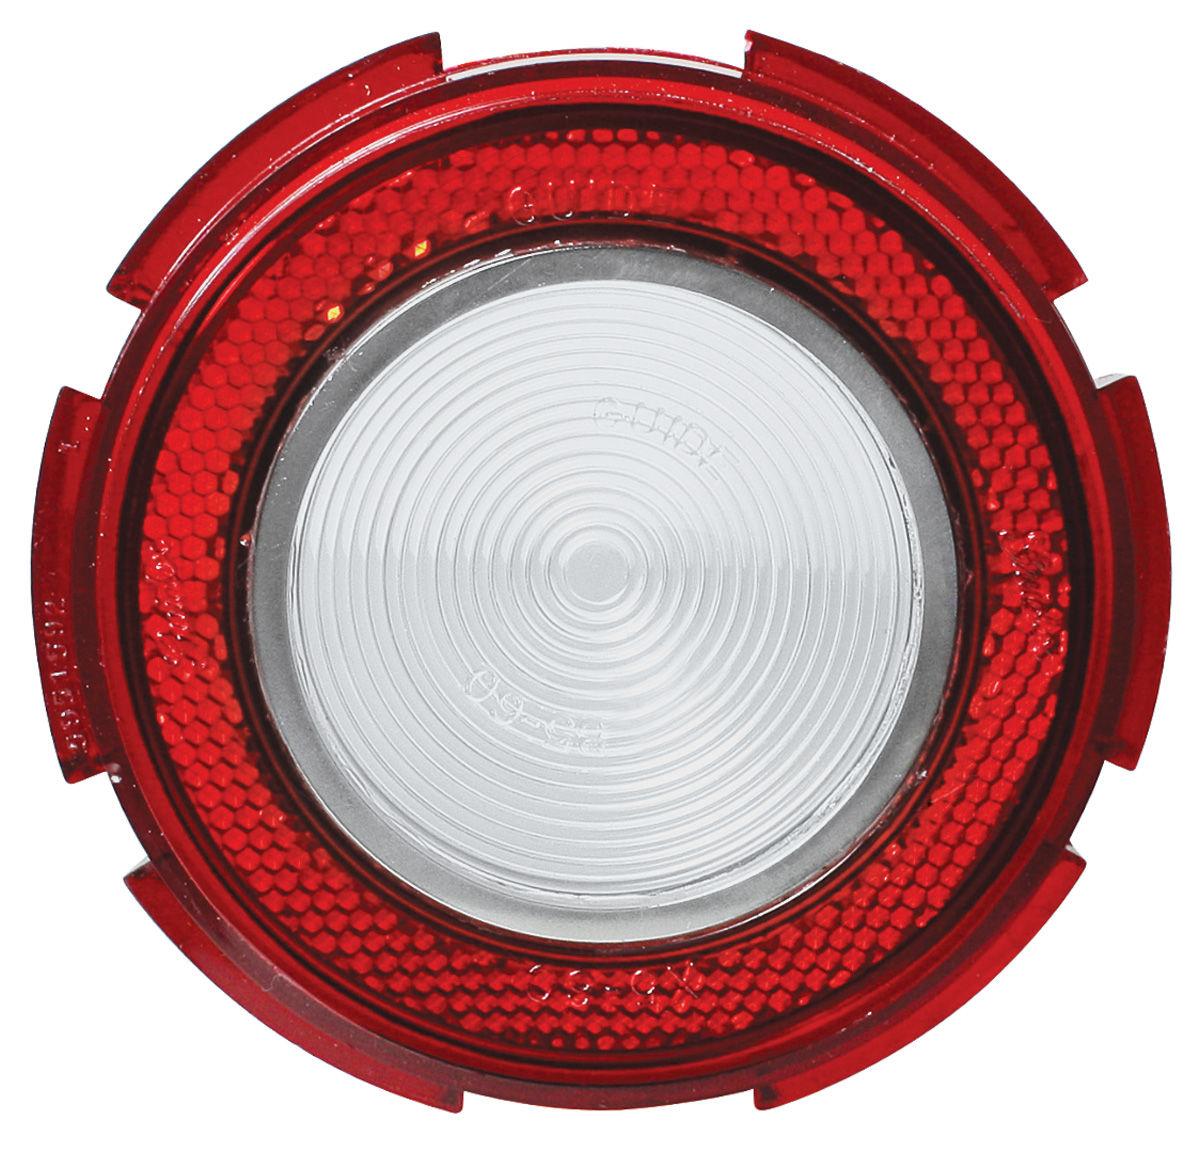 Back-Up Lamp Lens, 1960 Fits 1960 Fleetwood @ OPGI.com